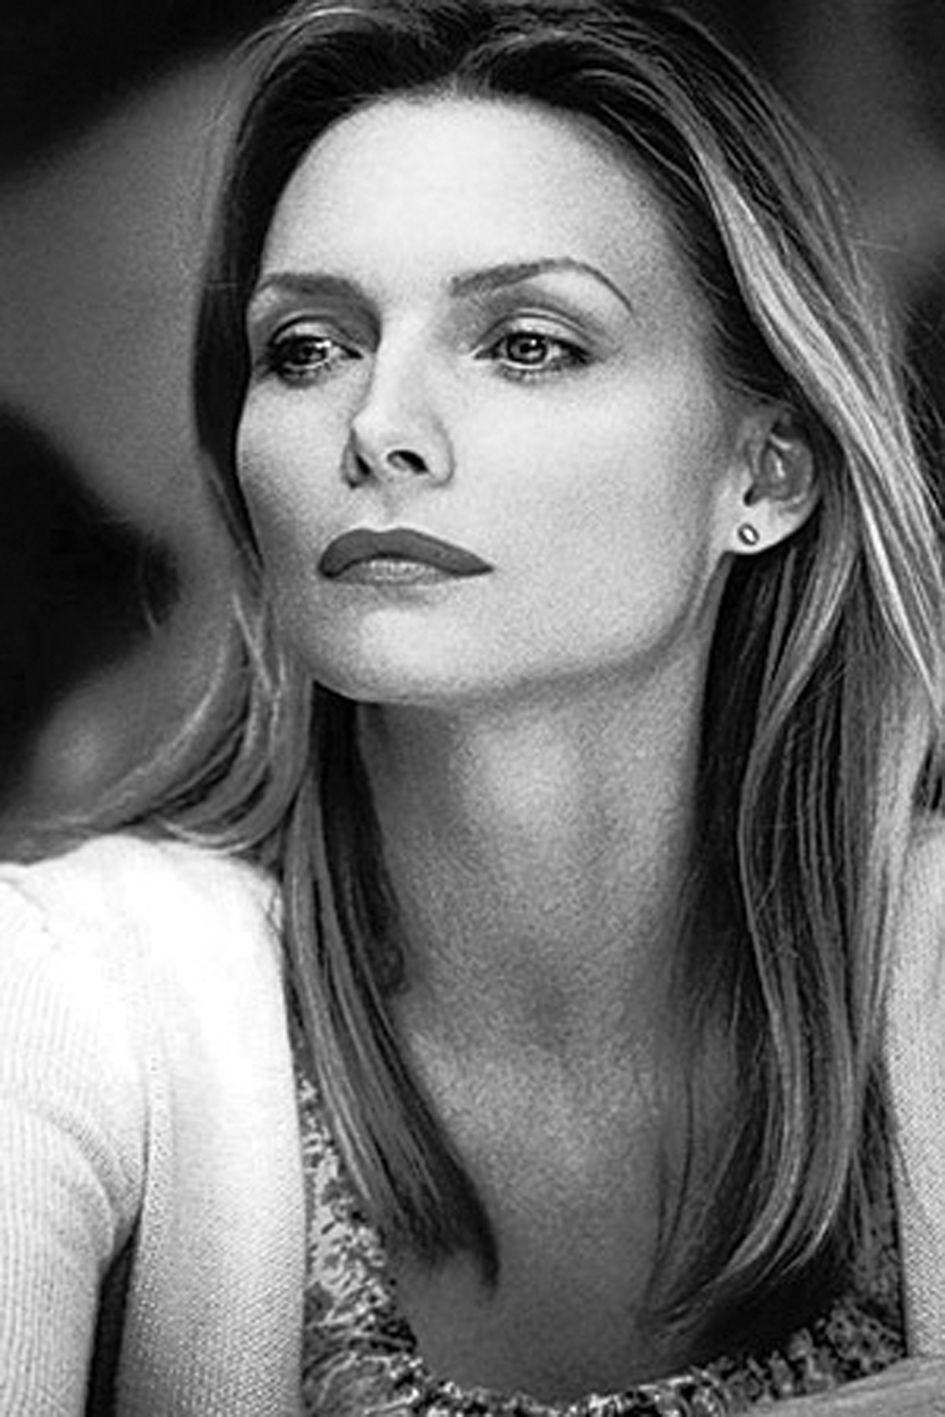 Elena-Christina Lebed now 45